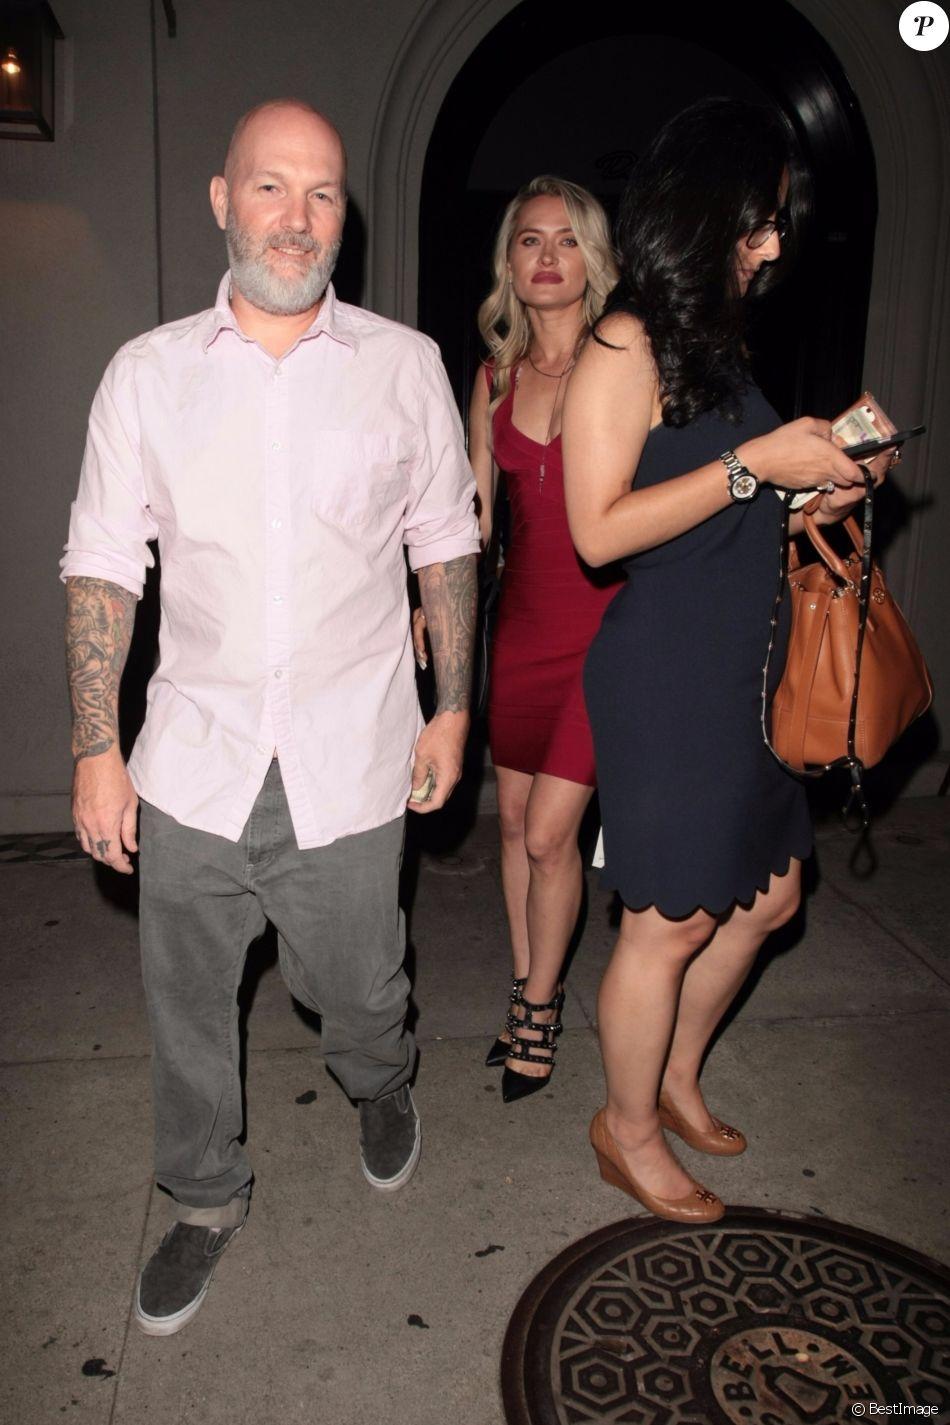 Fred Durst (Limp Bizkit) et sa femme Kseniya Beryazina à Hollywood le 6 septembre 2017, après un dîner chez Craig's.